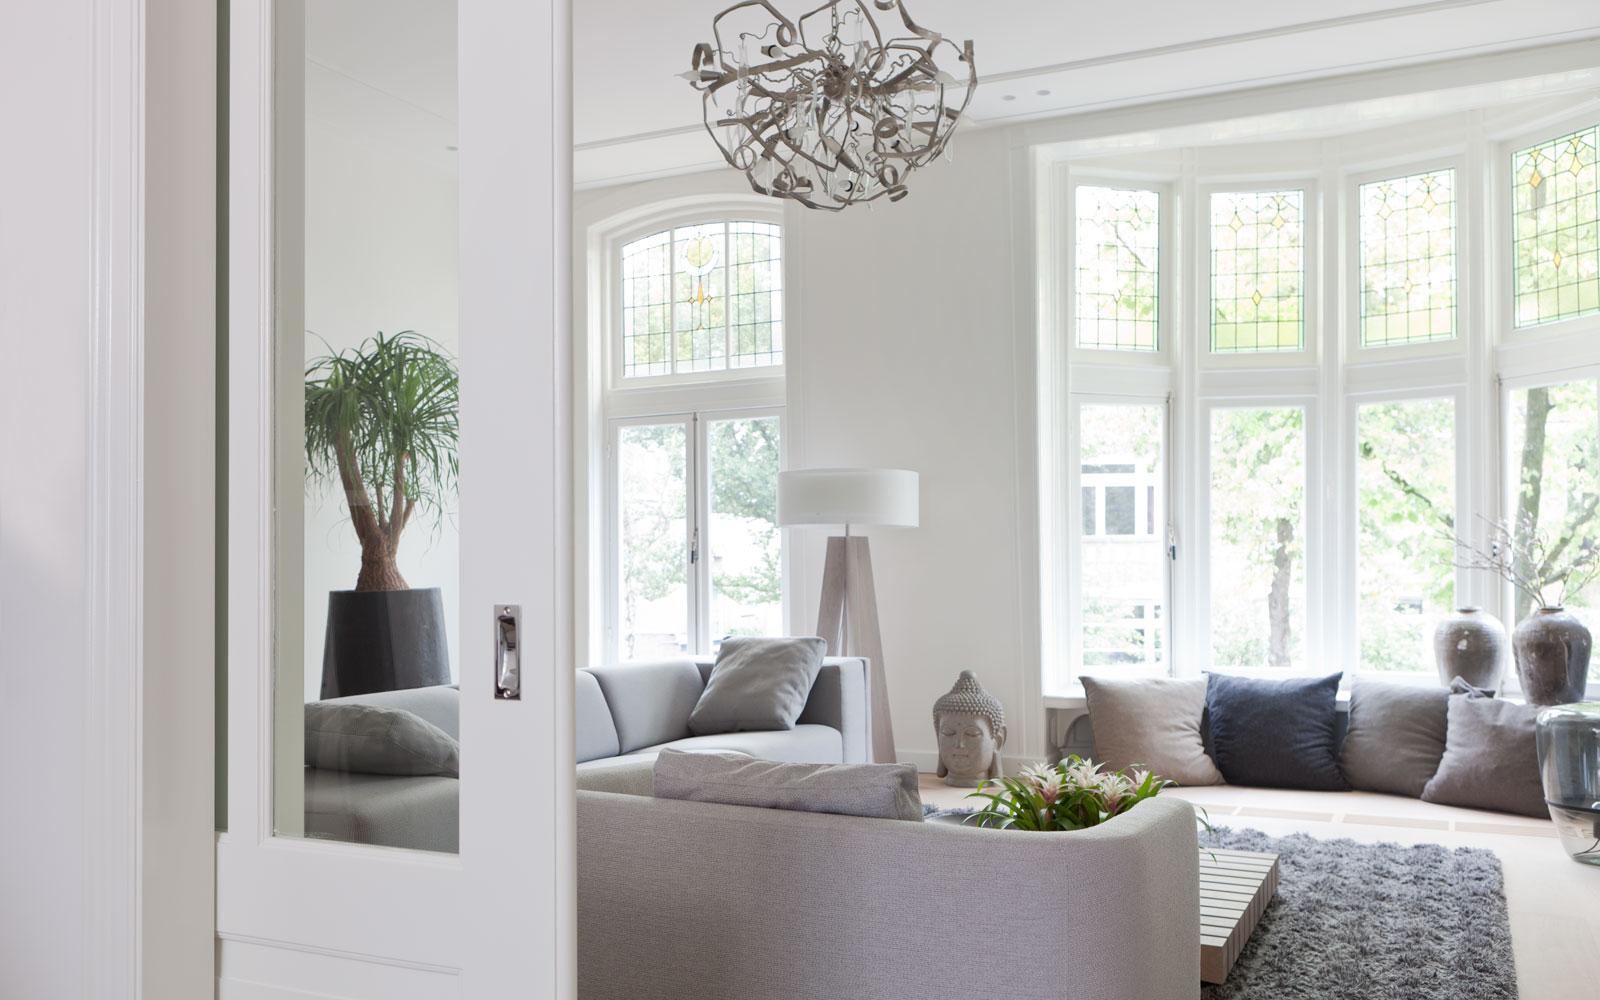 Tafel Remy Meijers : Stadsvilla amsterdam remy meijers the art of living nl